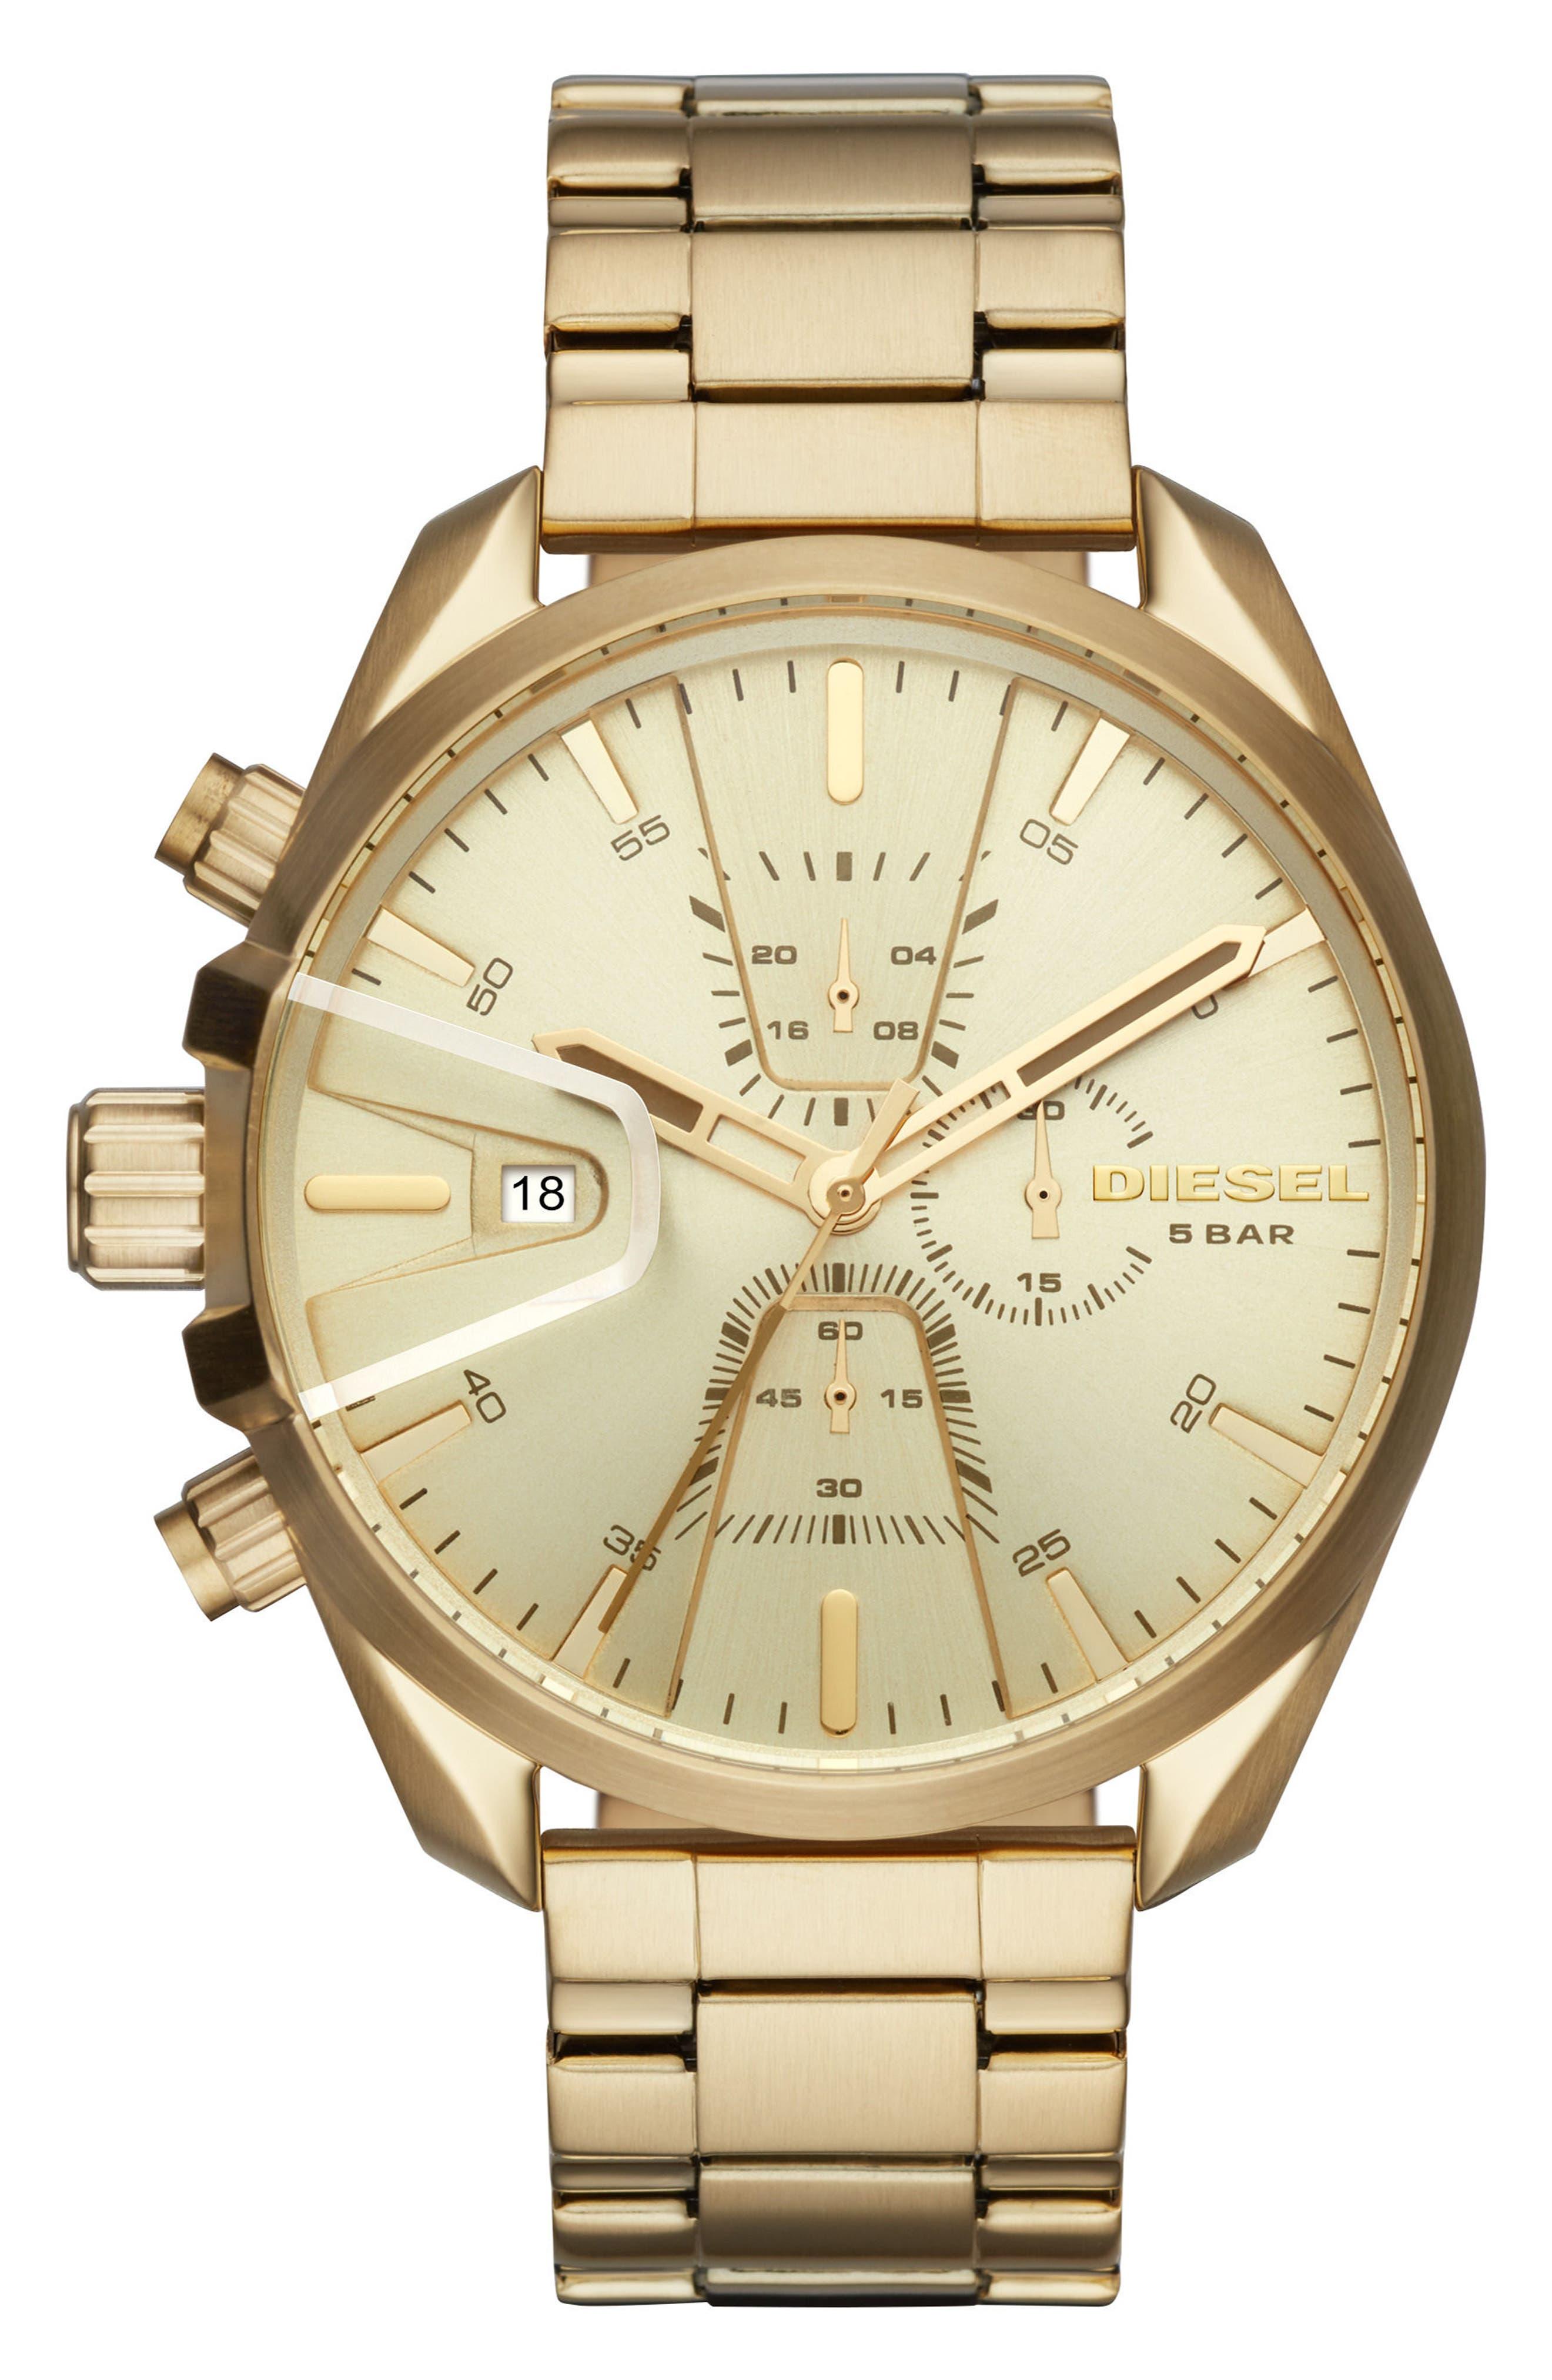 DIESEL<SUP>®</SUP>, MS9 Chronograph Bracelet Watch, 47mm x 54mm, Main thumbnail 1, color, 710